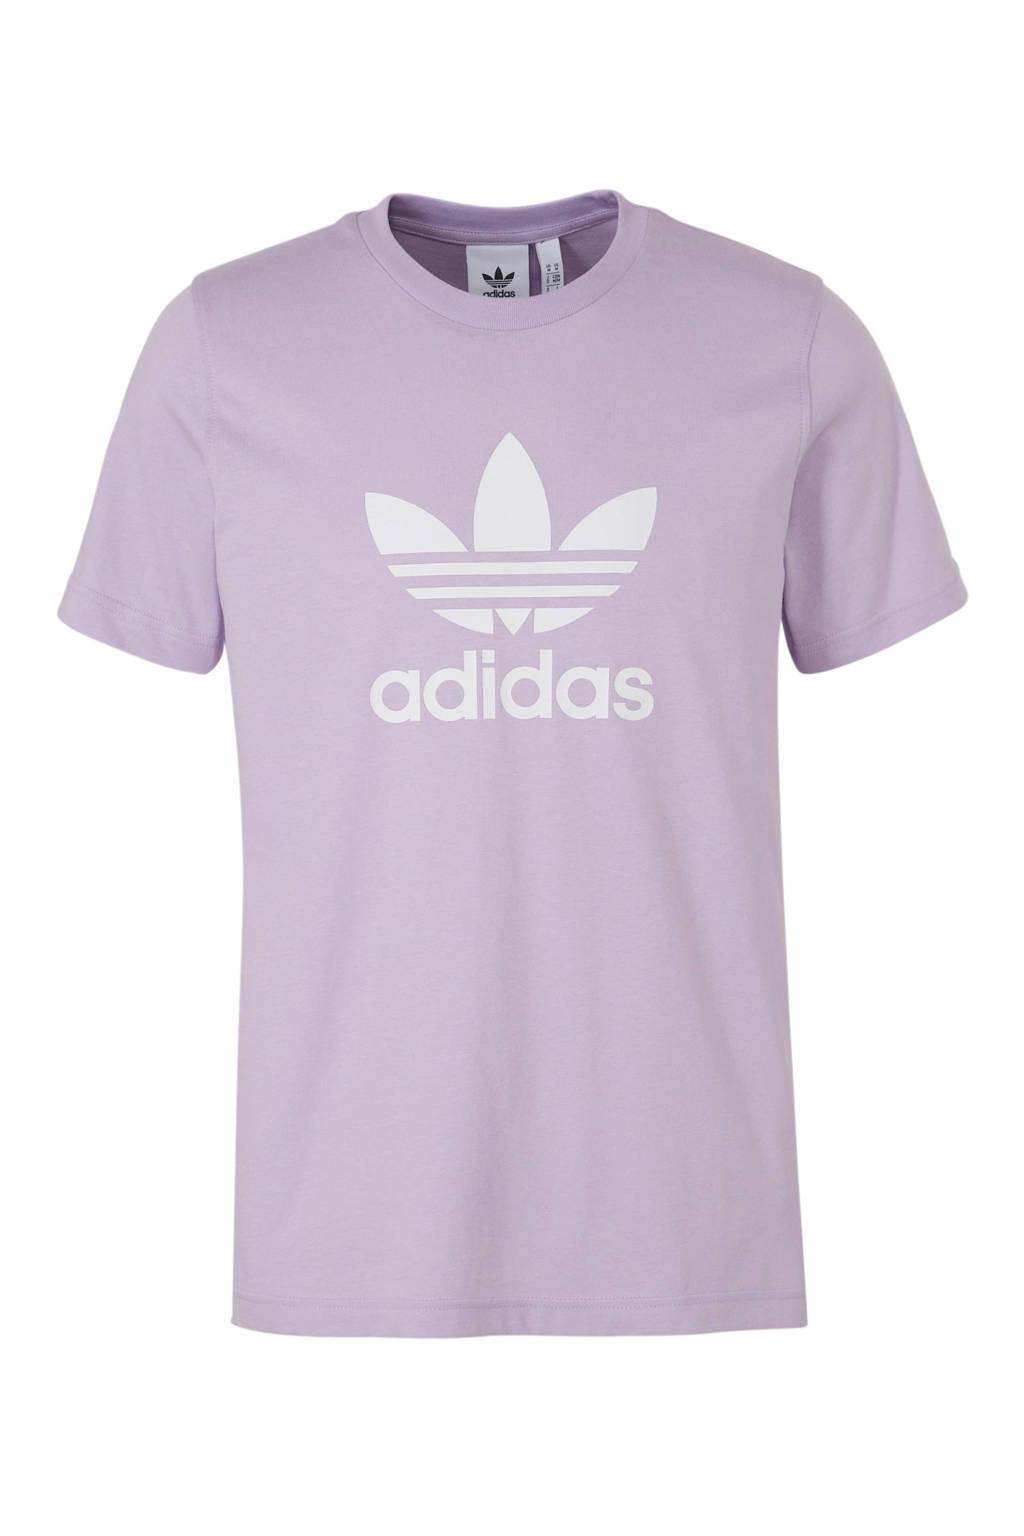 adidas originals   T-shirt paars, Paars/wit